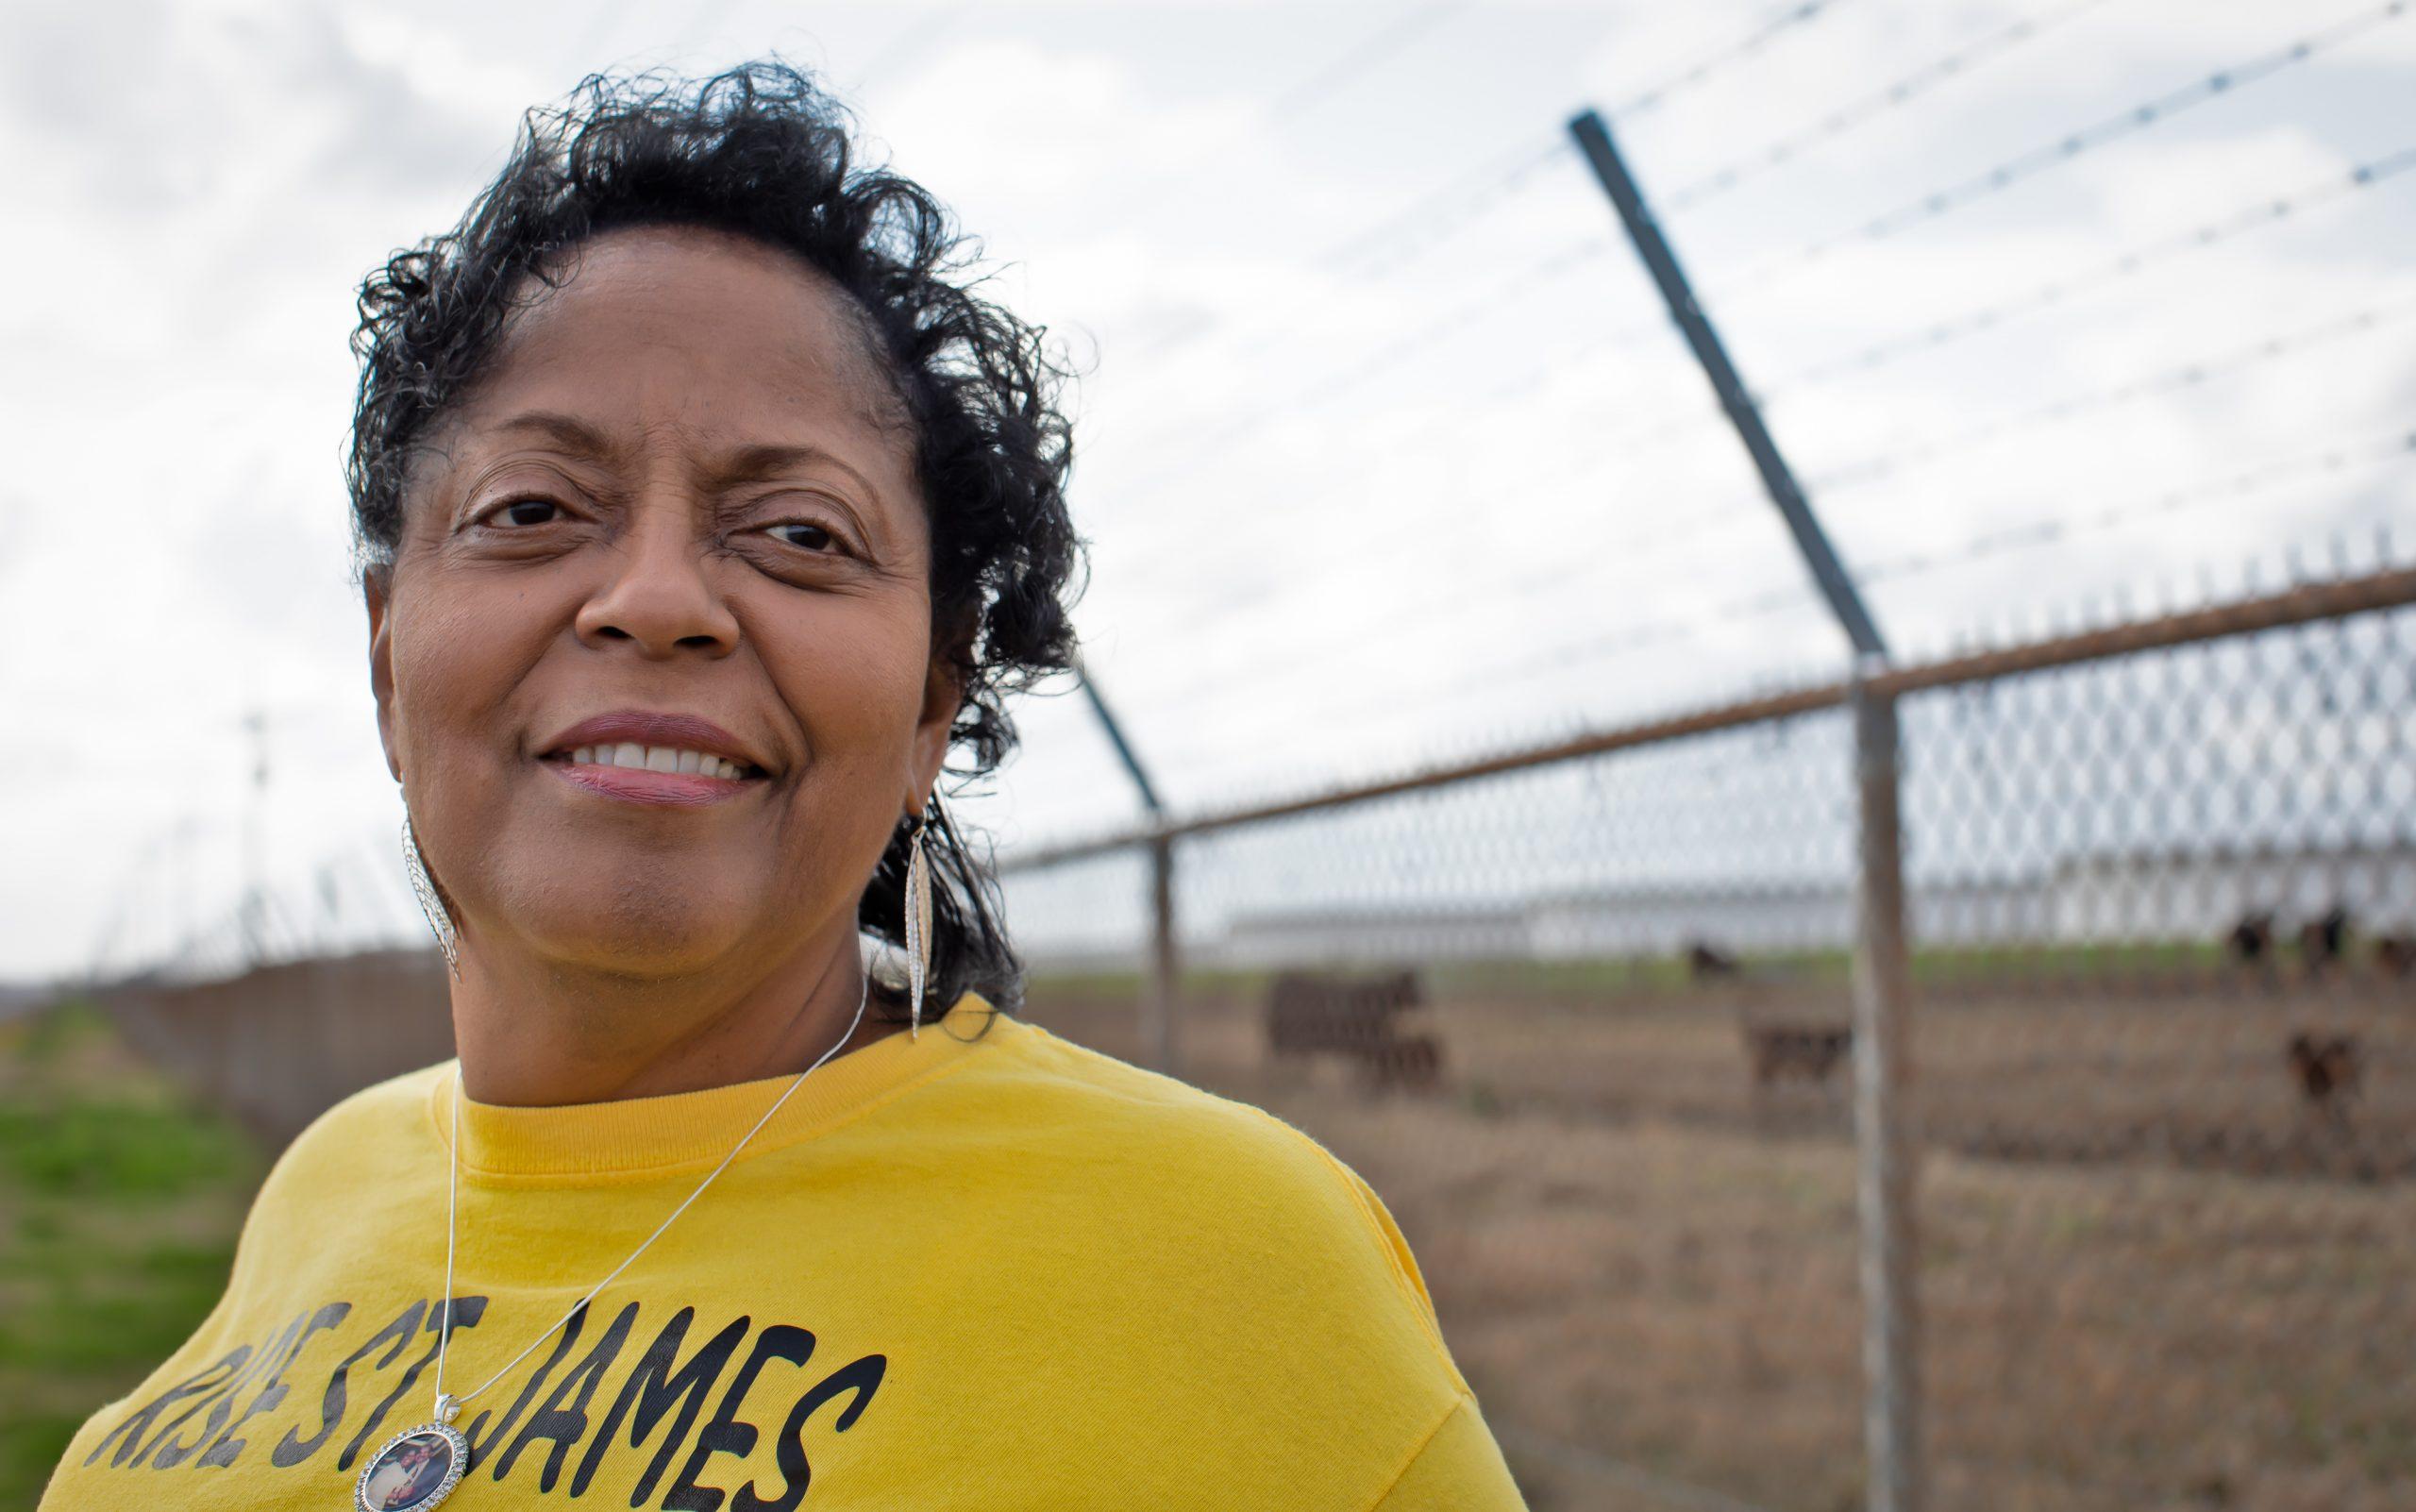 RISE St. James founder Sharon Lavigne wins Goldman Environmental Prize